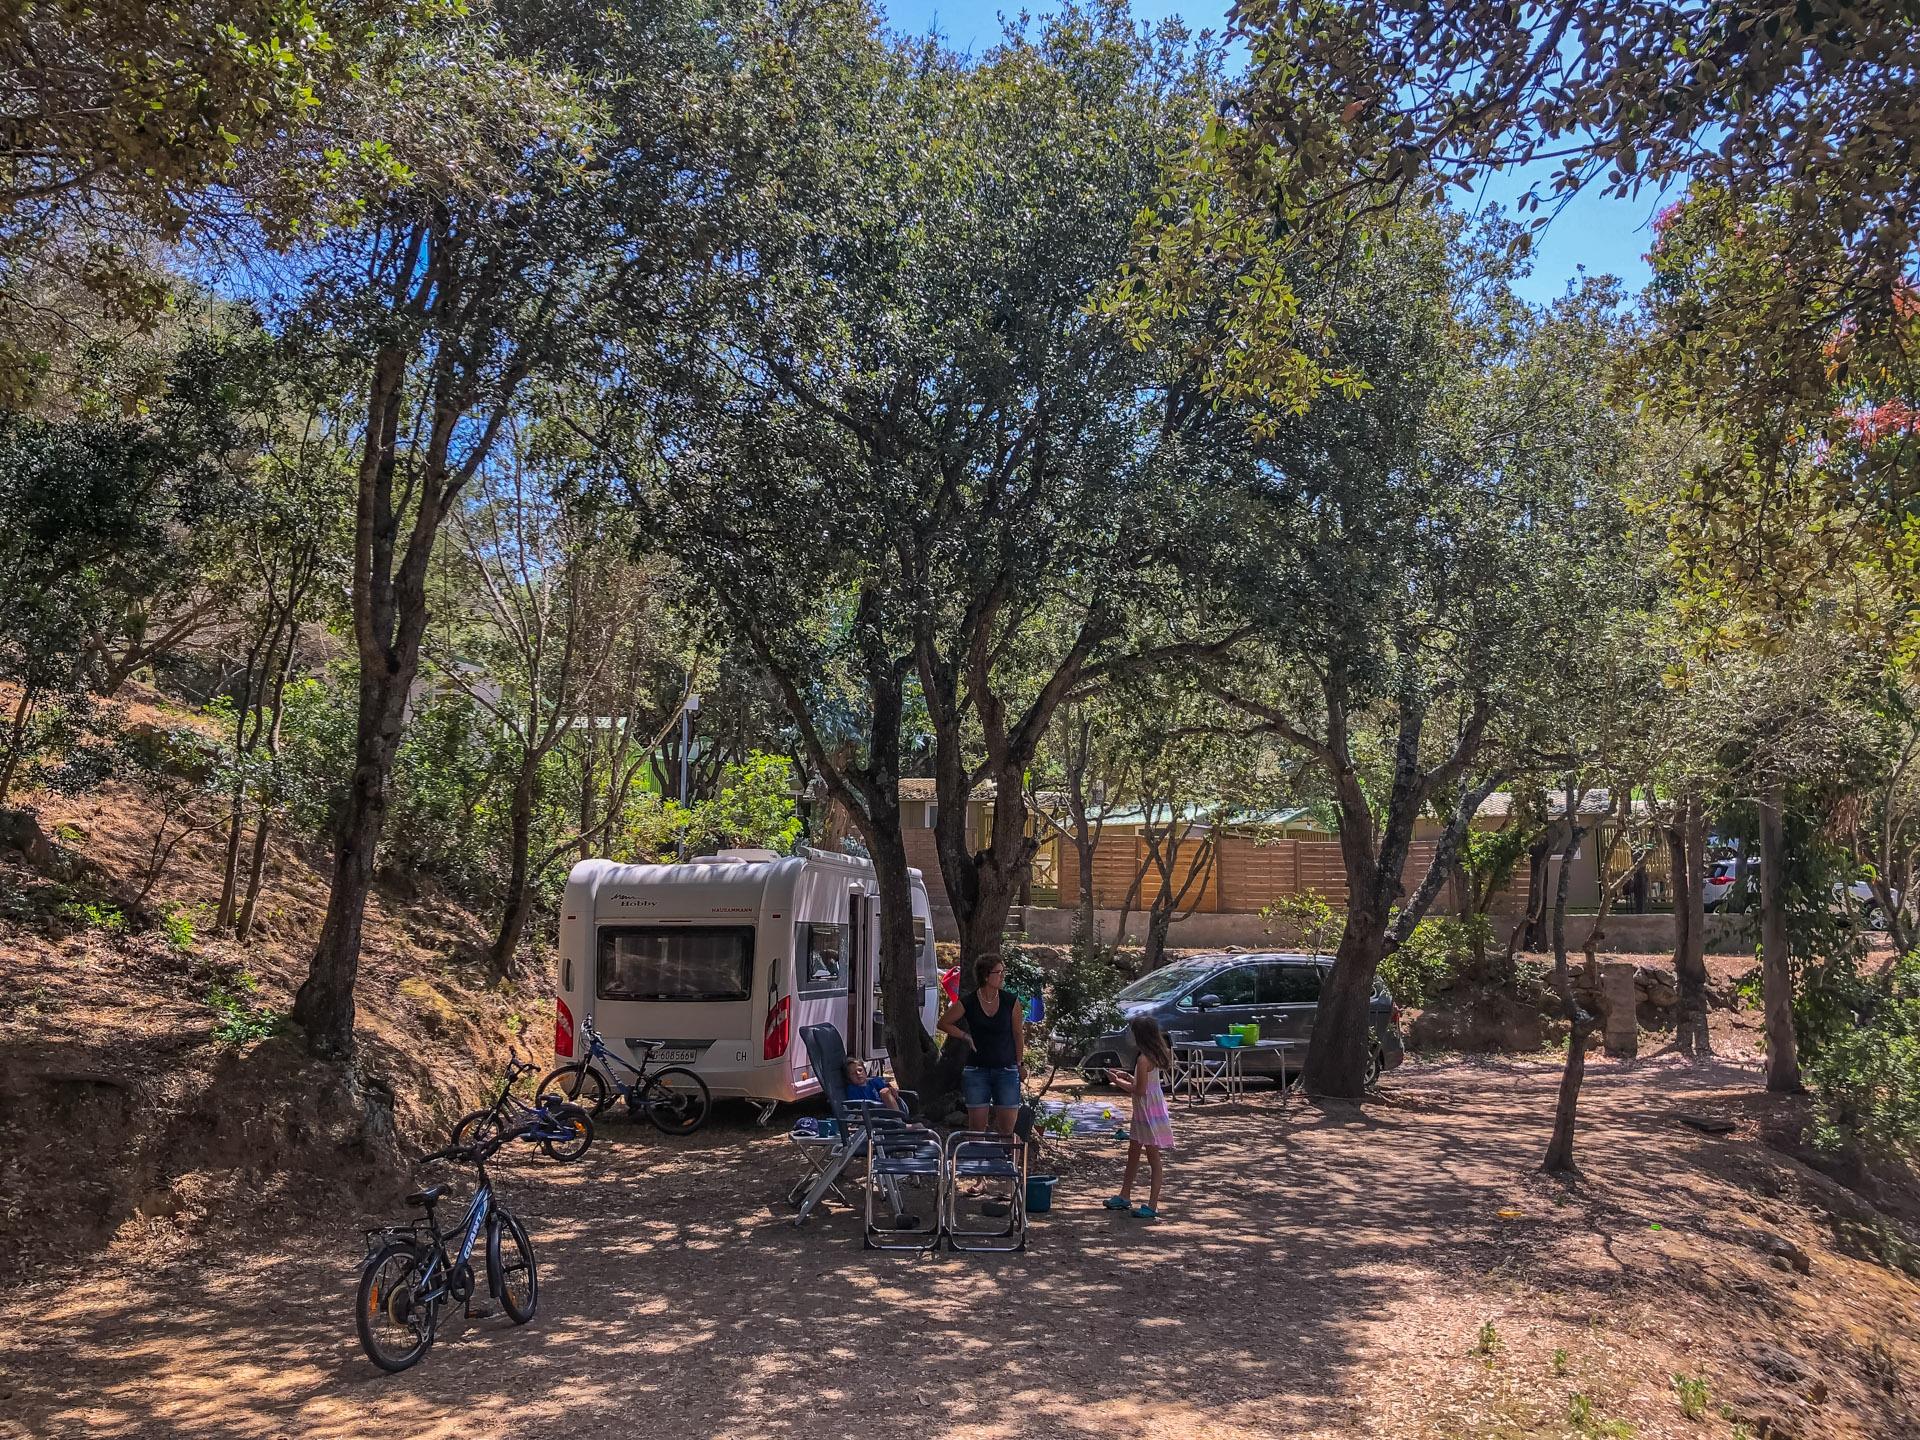 Camping U Libecciu